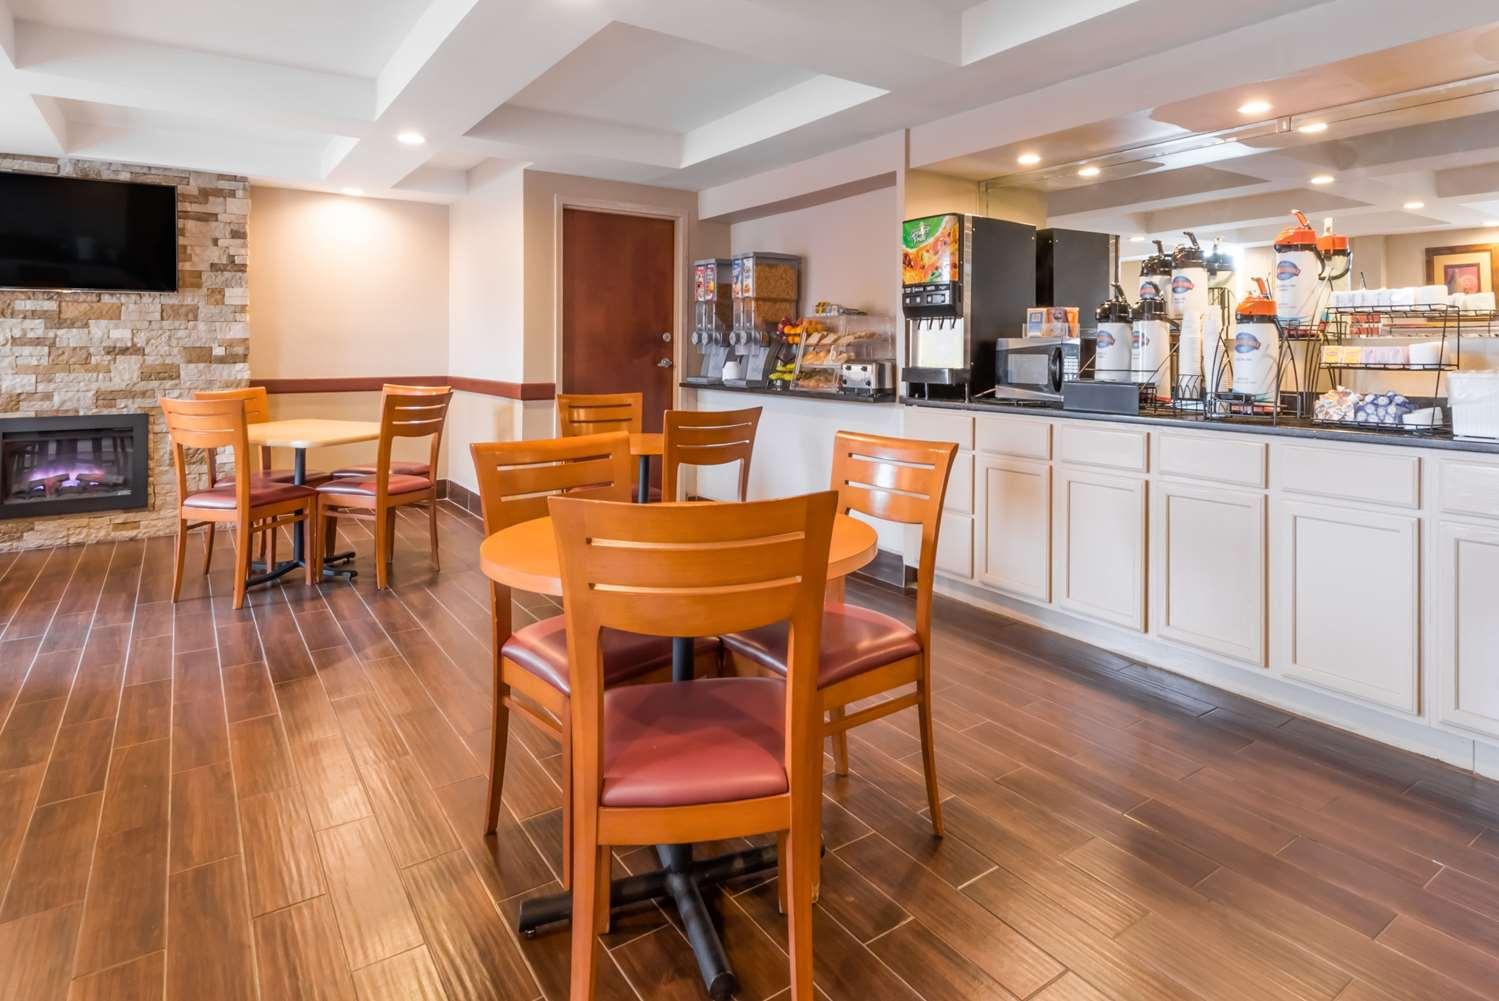 proam - Baymont Inn & Suites Georgetown